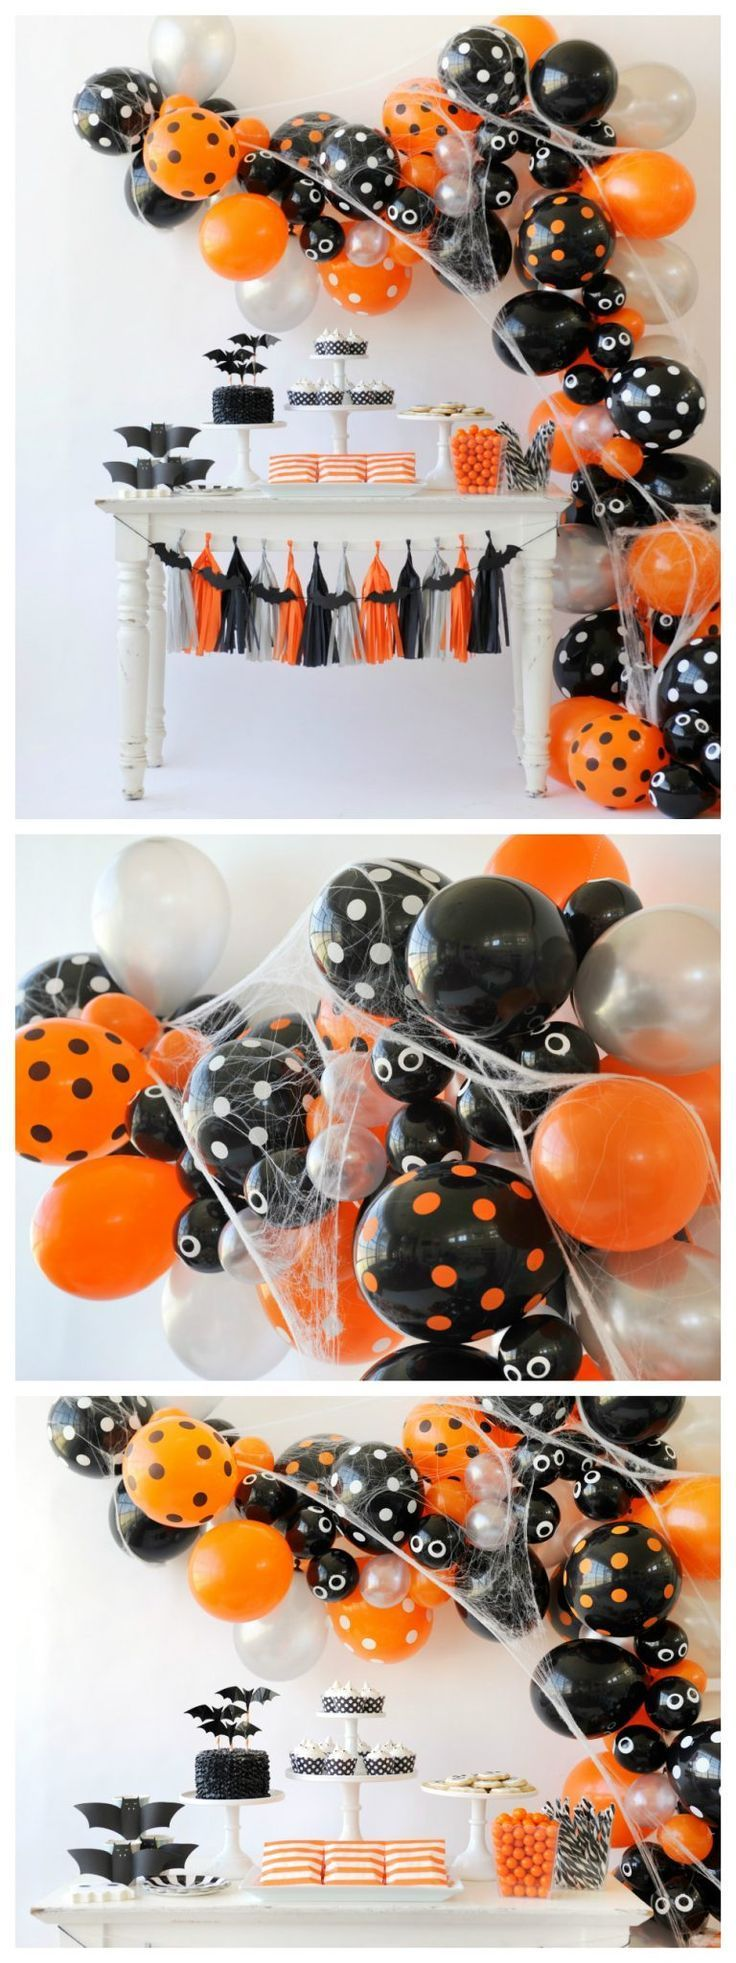 Spooky Halloween Balloon Garland - #Balloon #Garland #Halloween #Spooky